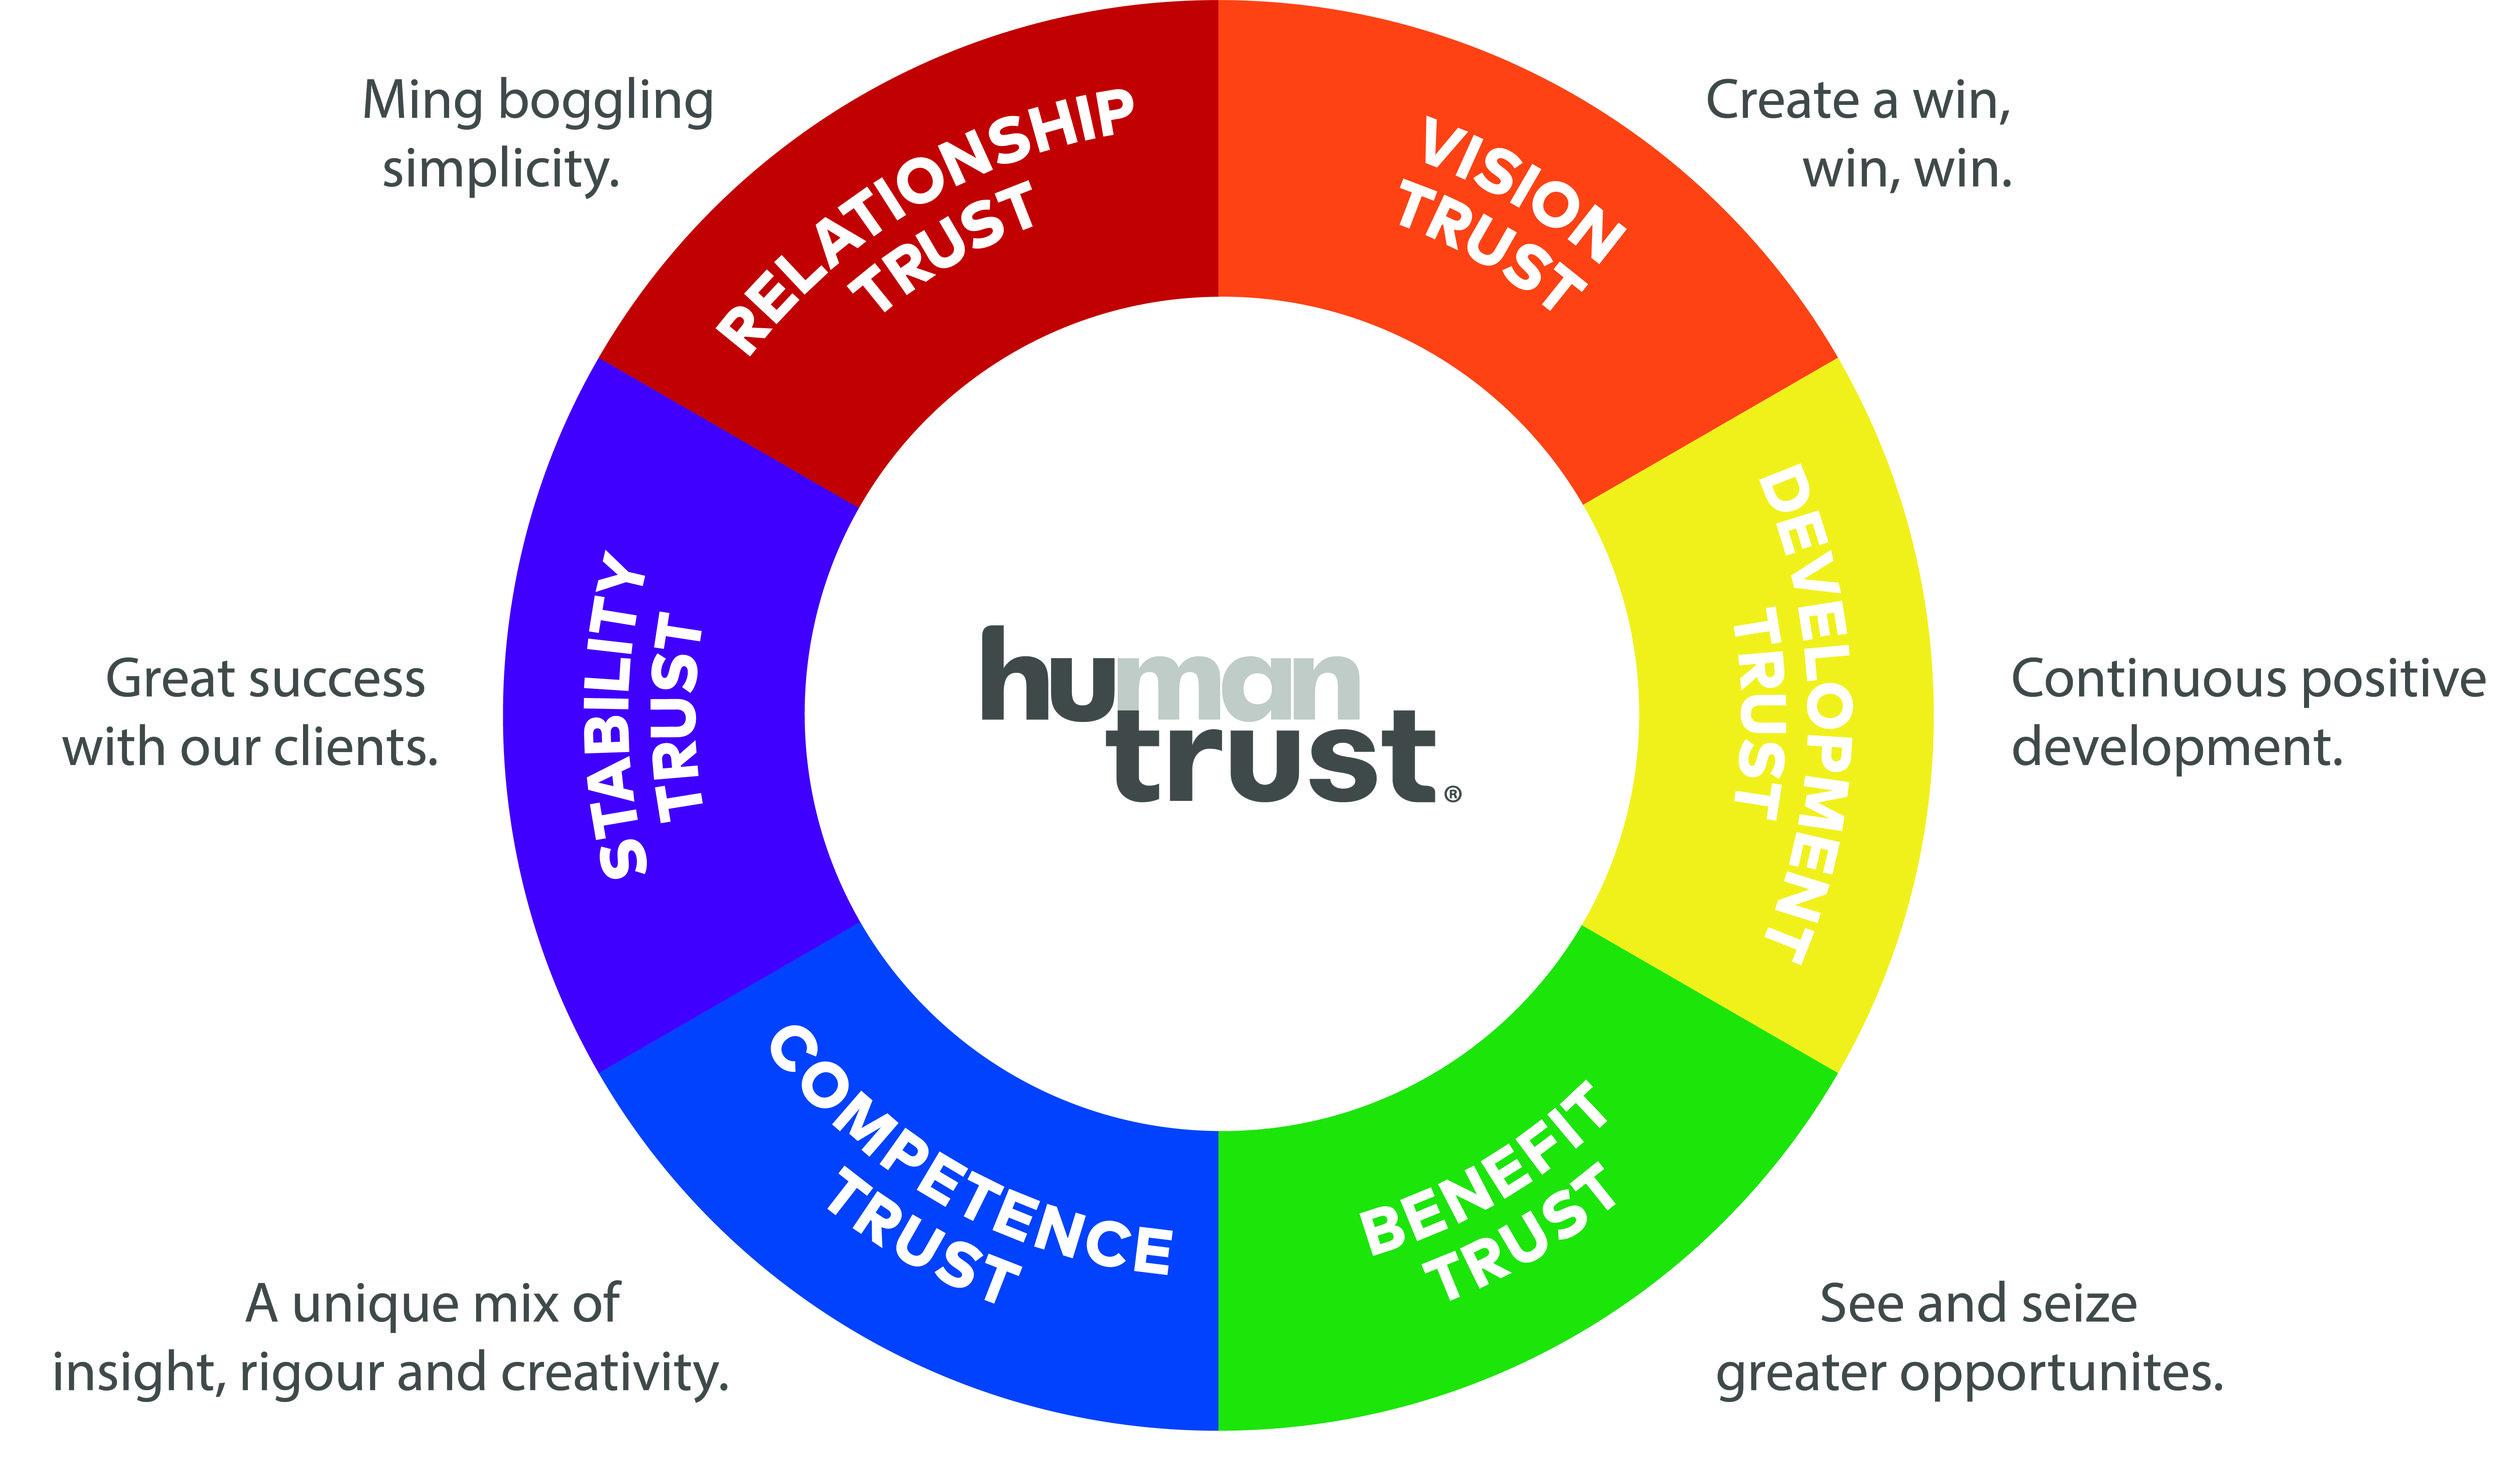 Mext_Consulting_Firm_Melbourne_Trust_HuTrust_Model_Human_Trust_Brand_Development.jpg